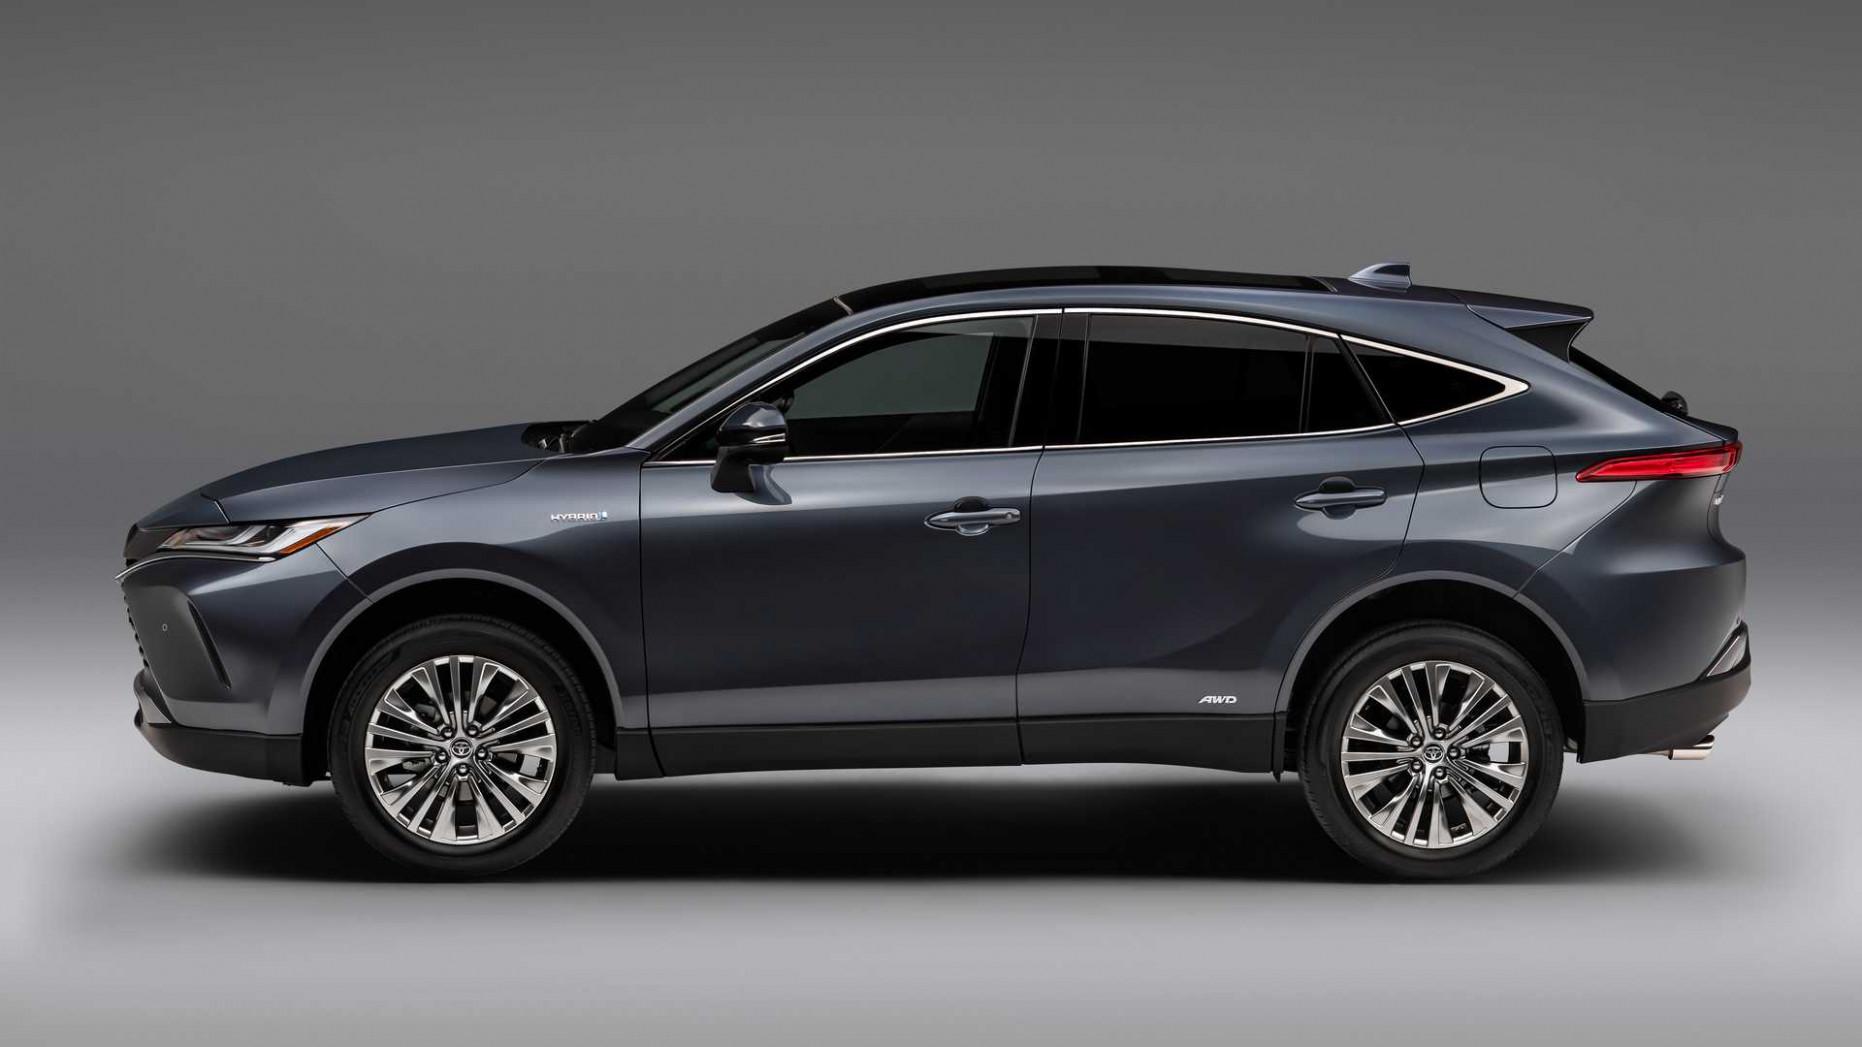 New Concept Toyota Venza 2022